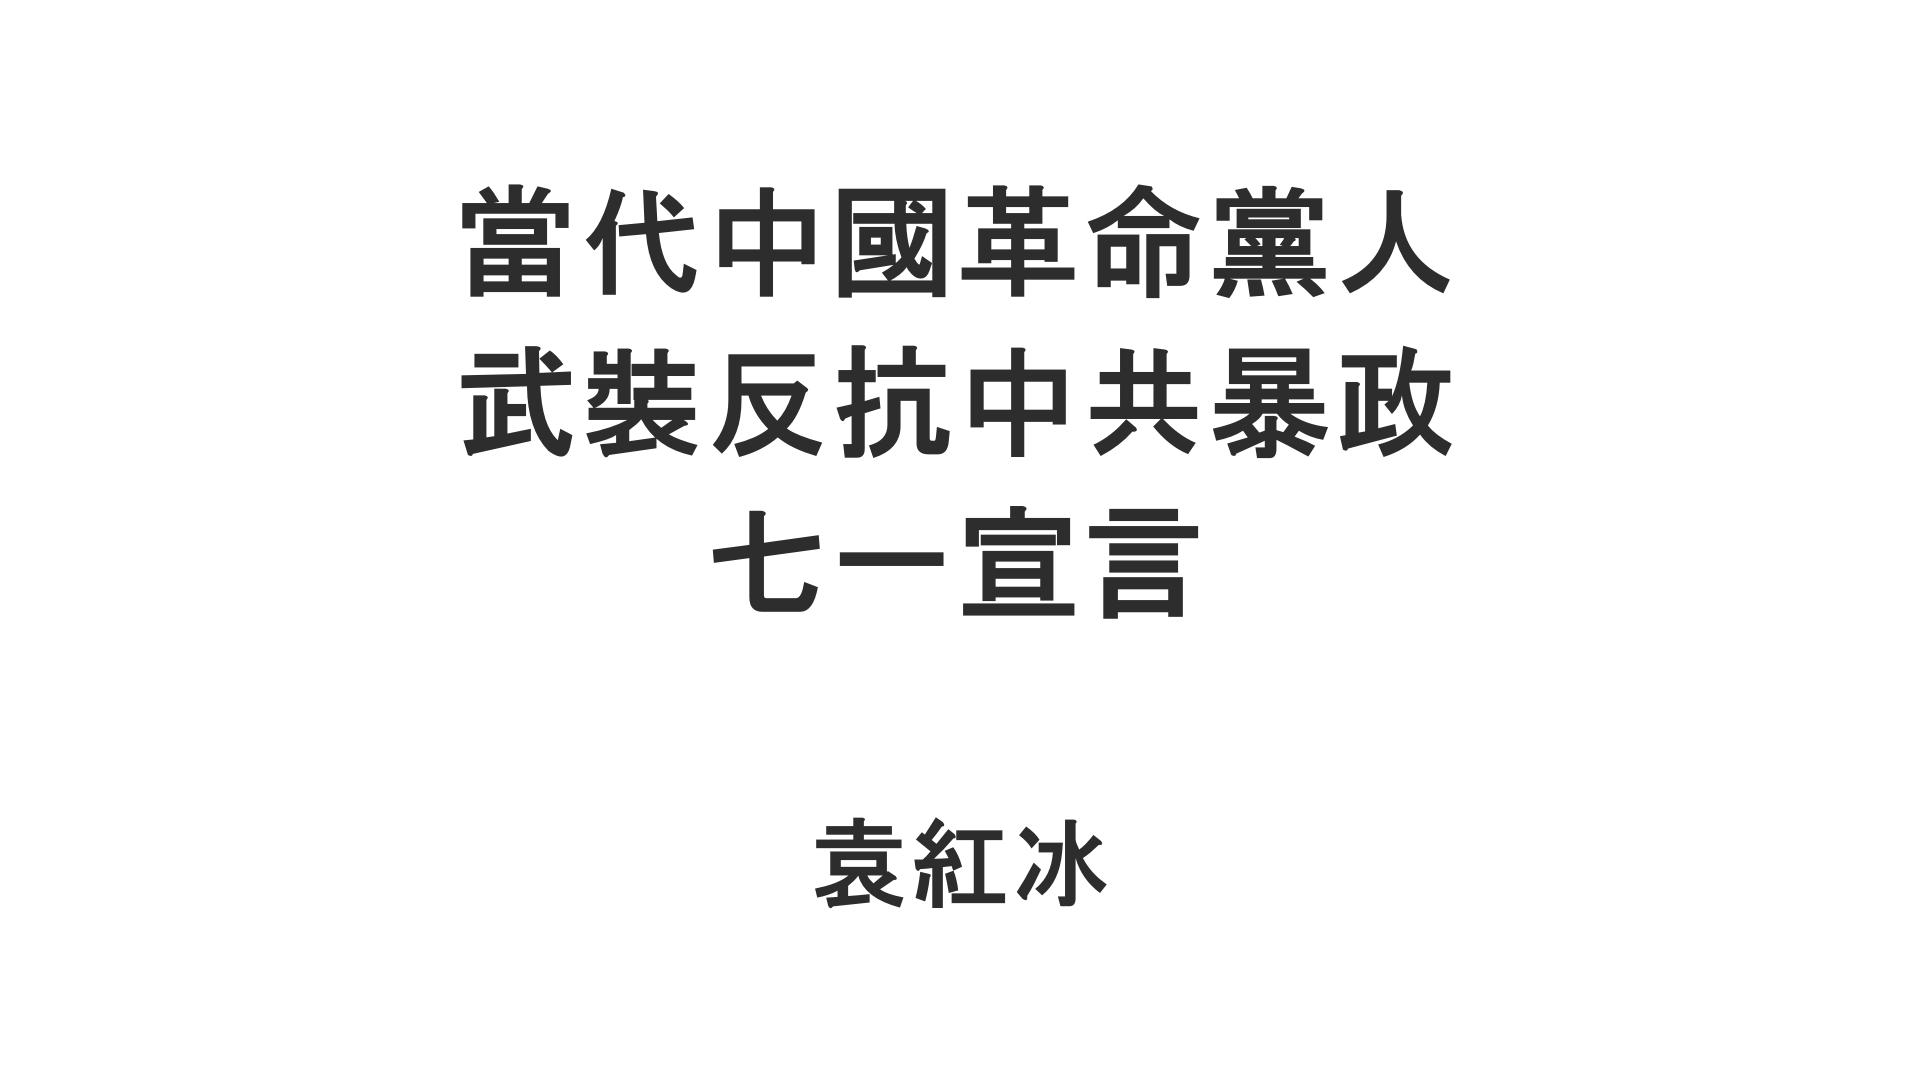 YuanHongBing-ZongLun-Special Program-07012021